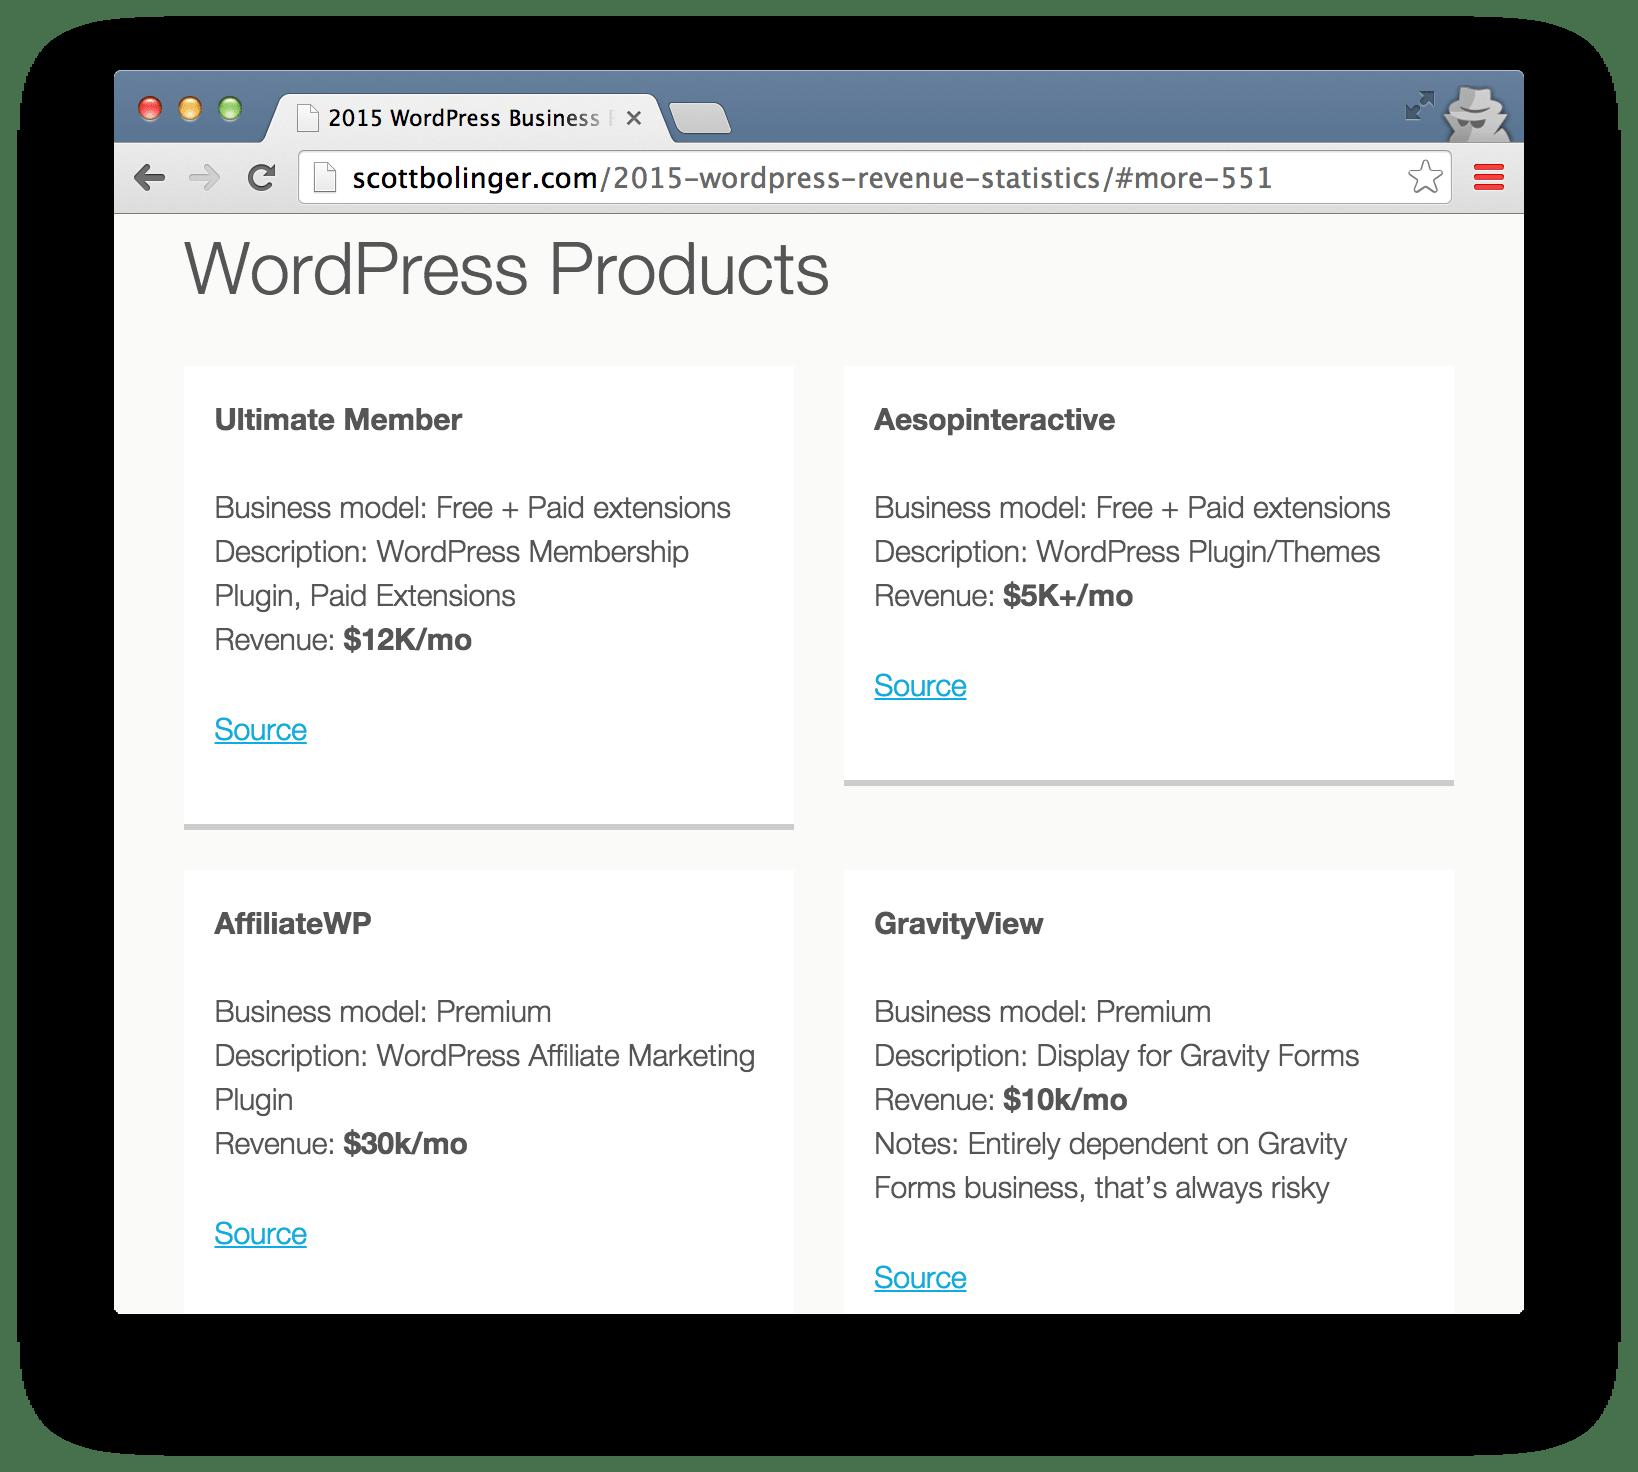 wordpress-business-revenue.png